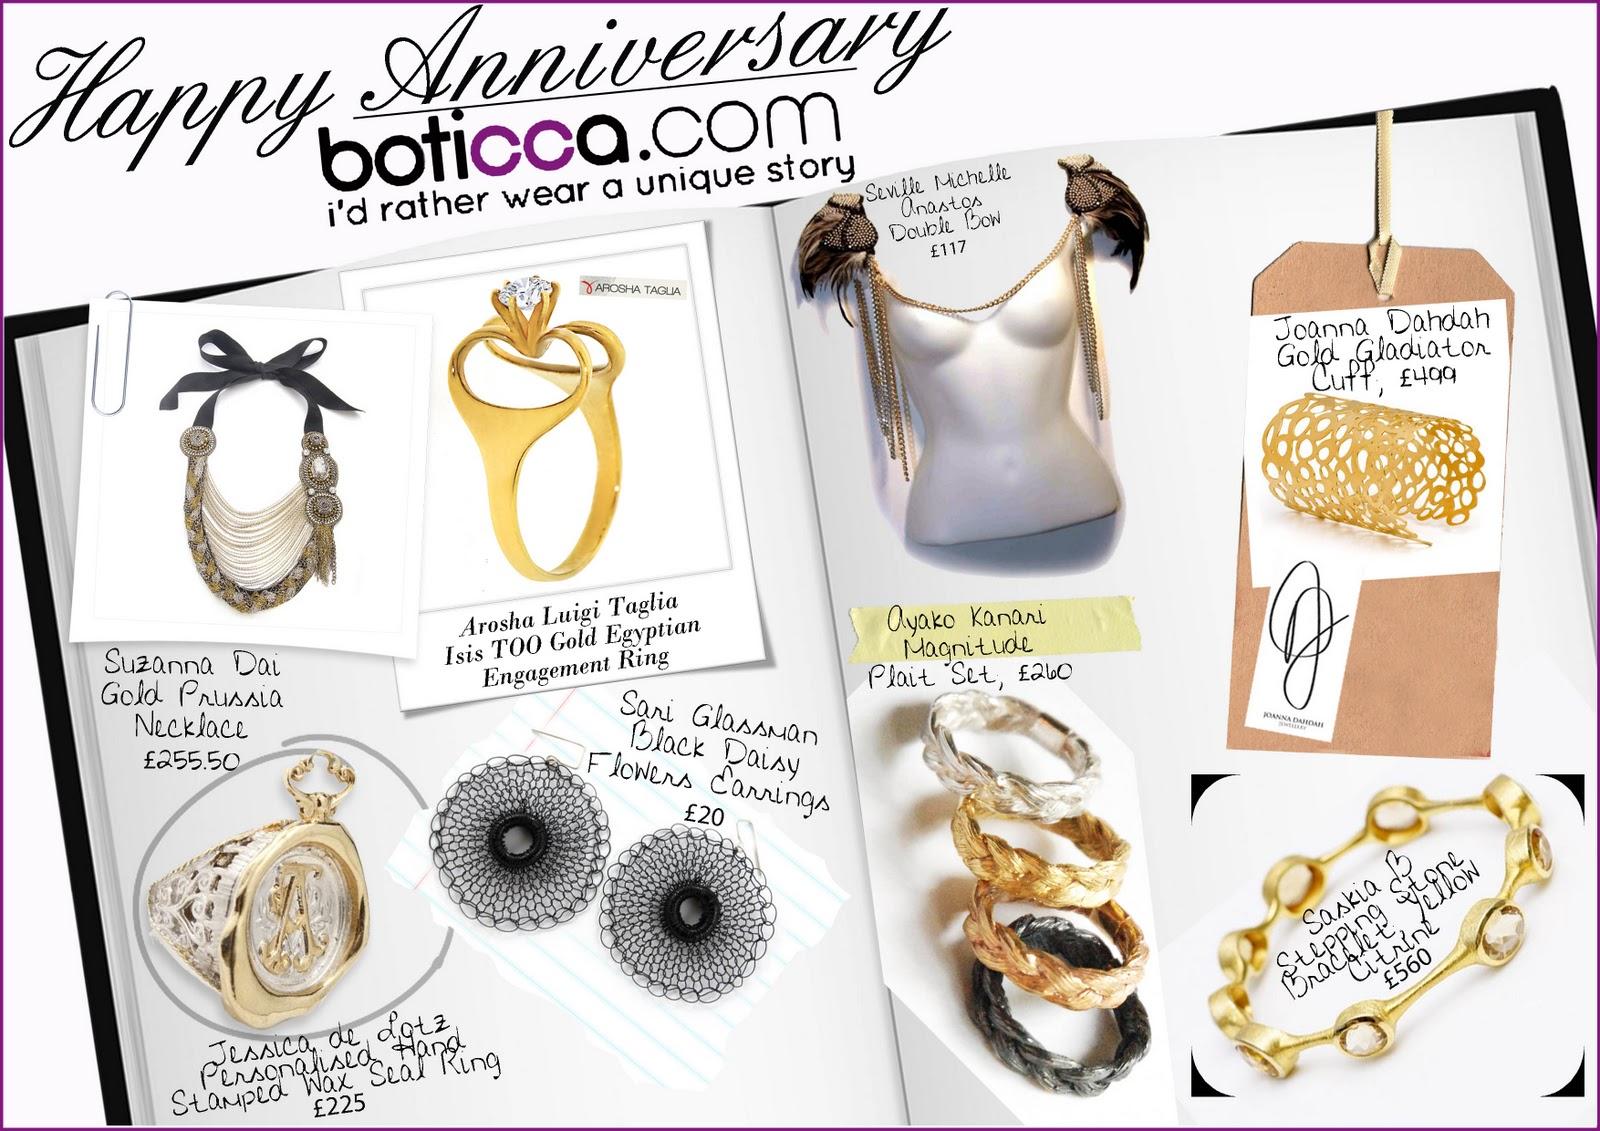 Happy Anniversary Boticca - by Sarah-Hayley Owen